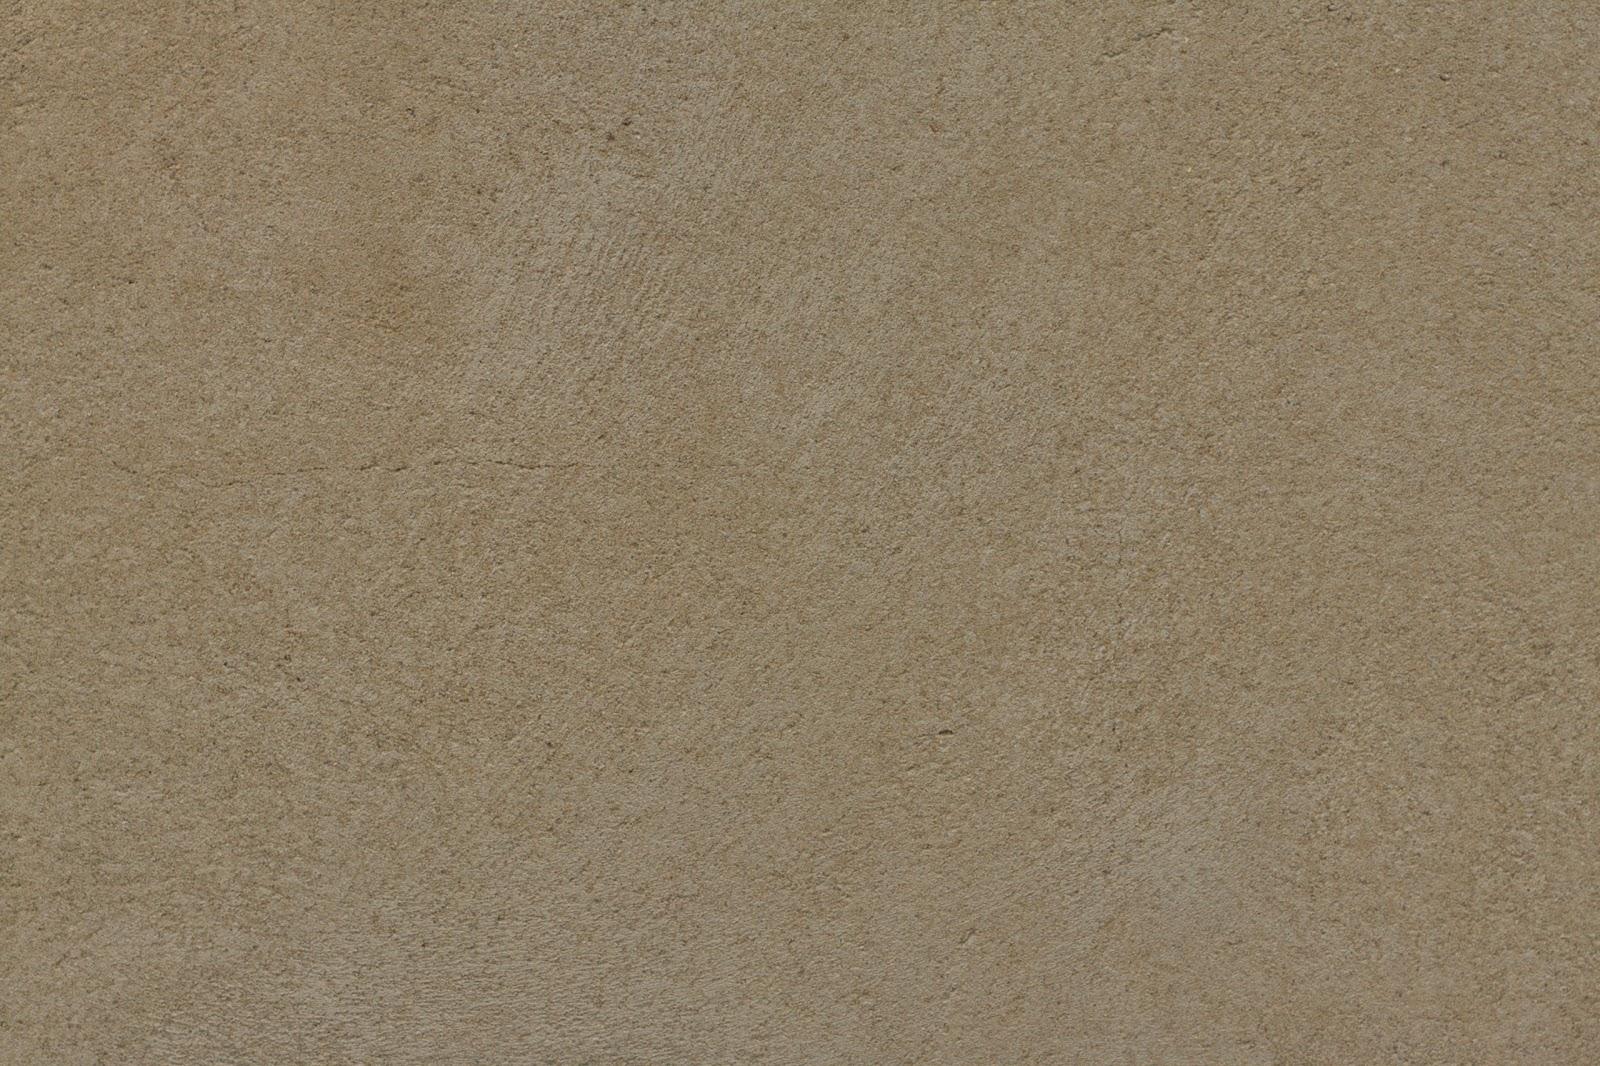 High Resolution Seamless Textures: Stucco rough light ...